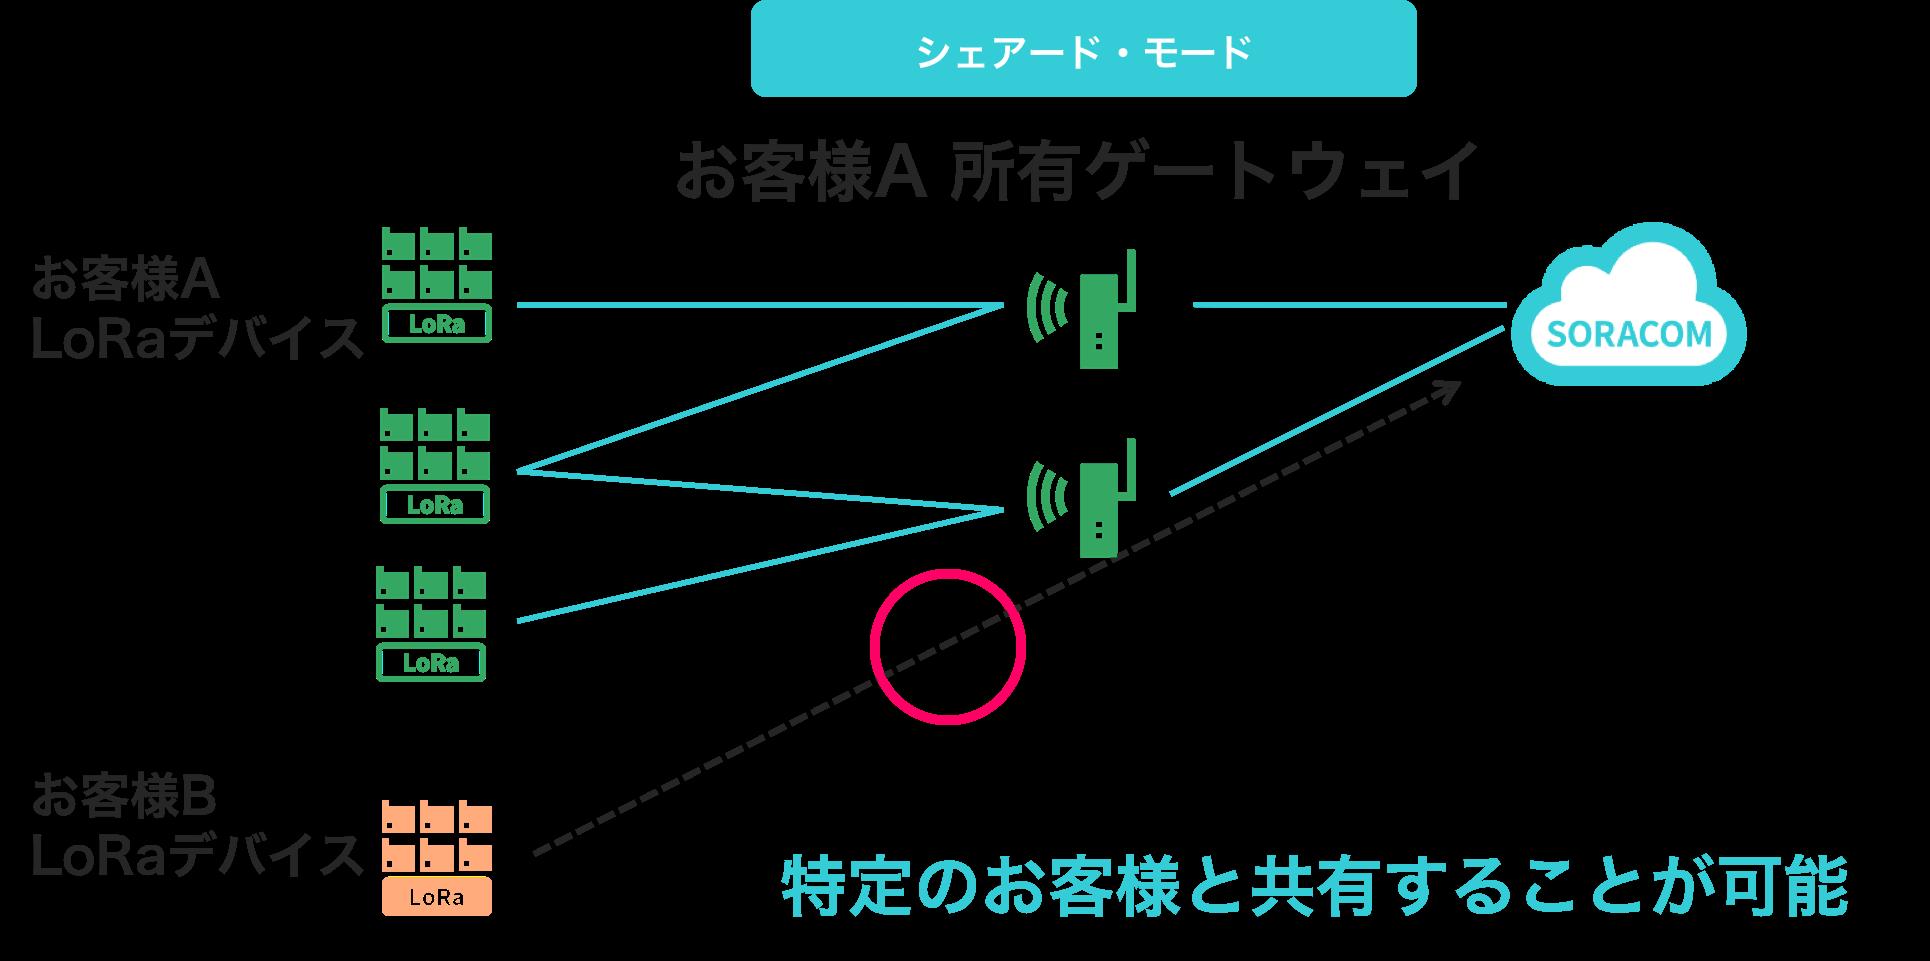 SORACOM Air for LoRaWAN ゲートウェイ シェアード・モード